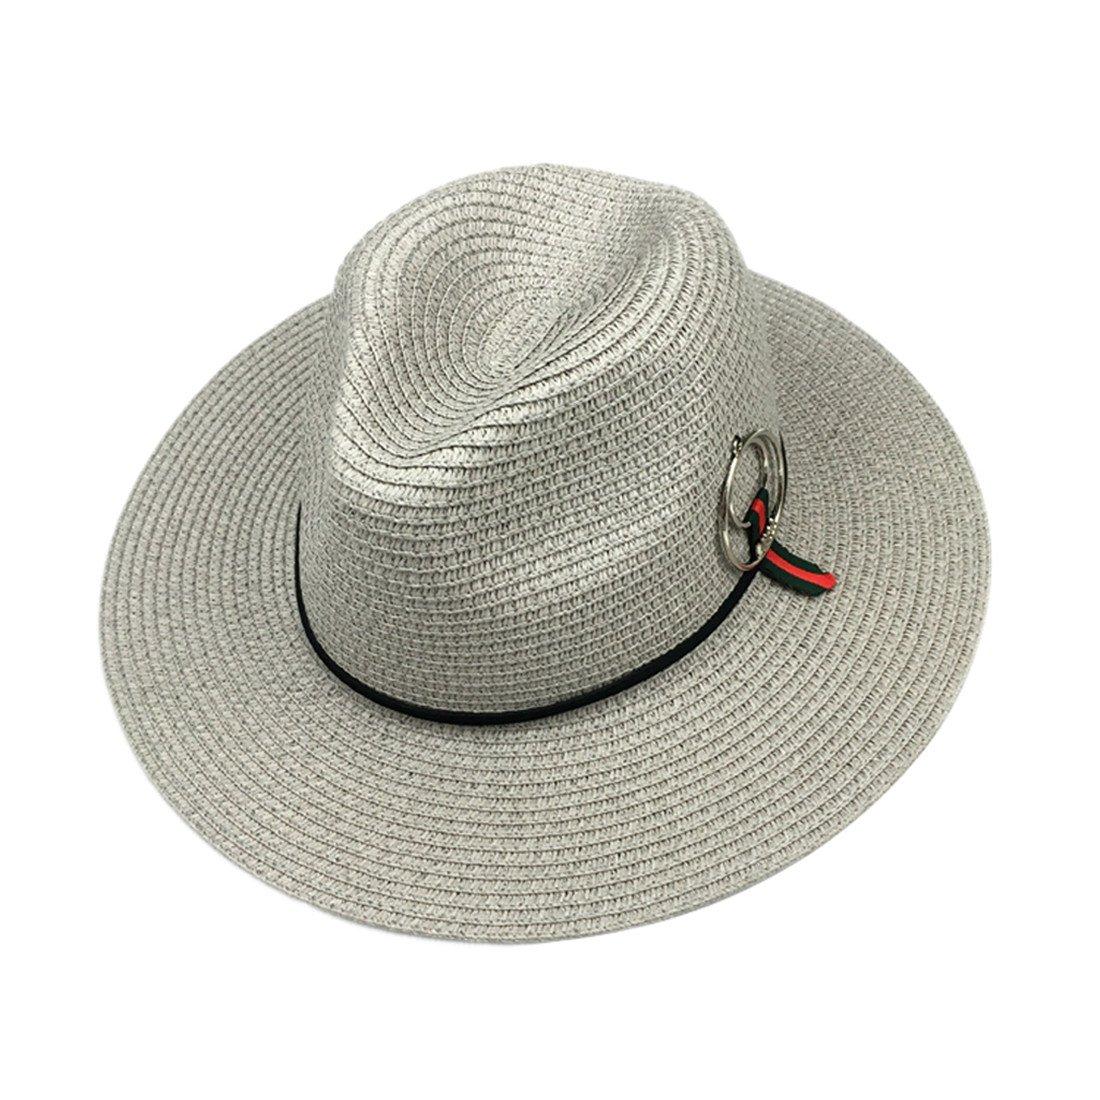 ACVIP Womens Summer Straw Beach Fedoras Beach Hat for Outdoor Leisure Time